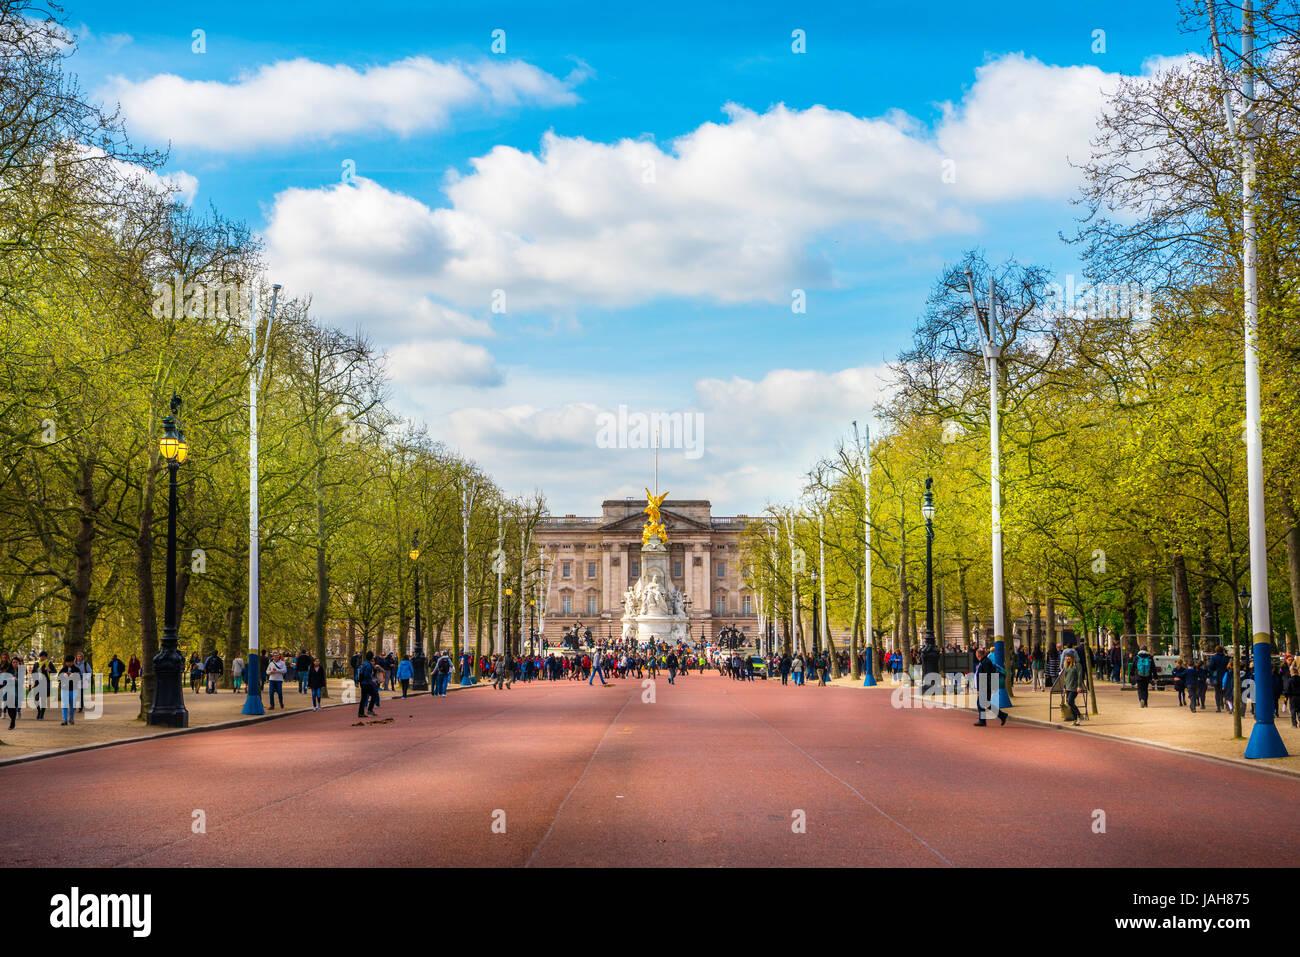 Buckingham Palace and Street The Mall, Westminster, London, England, United Kingdom Stock Photo